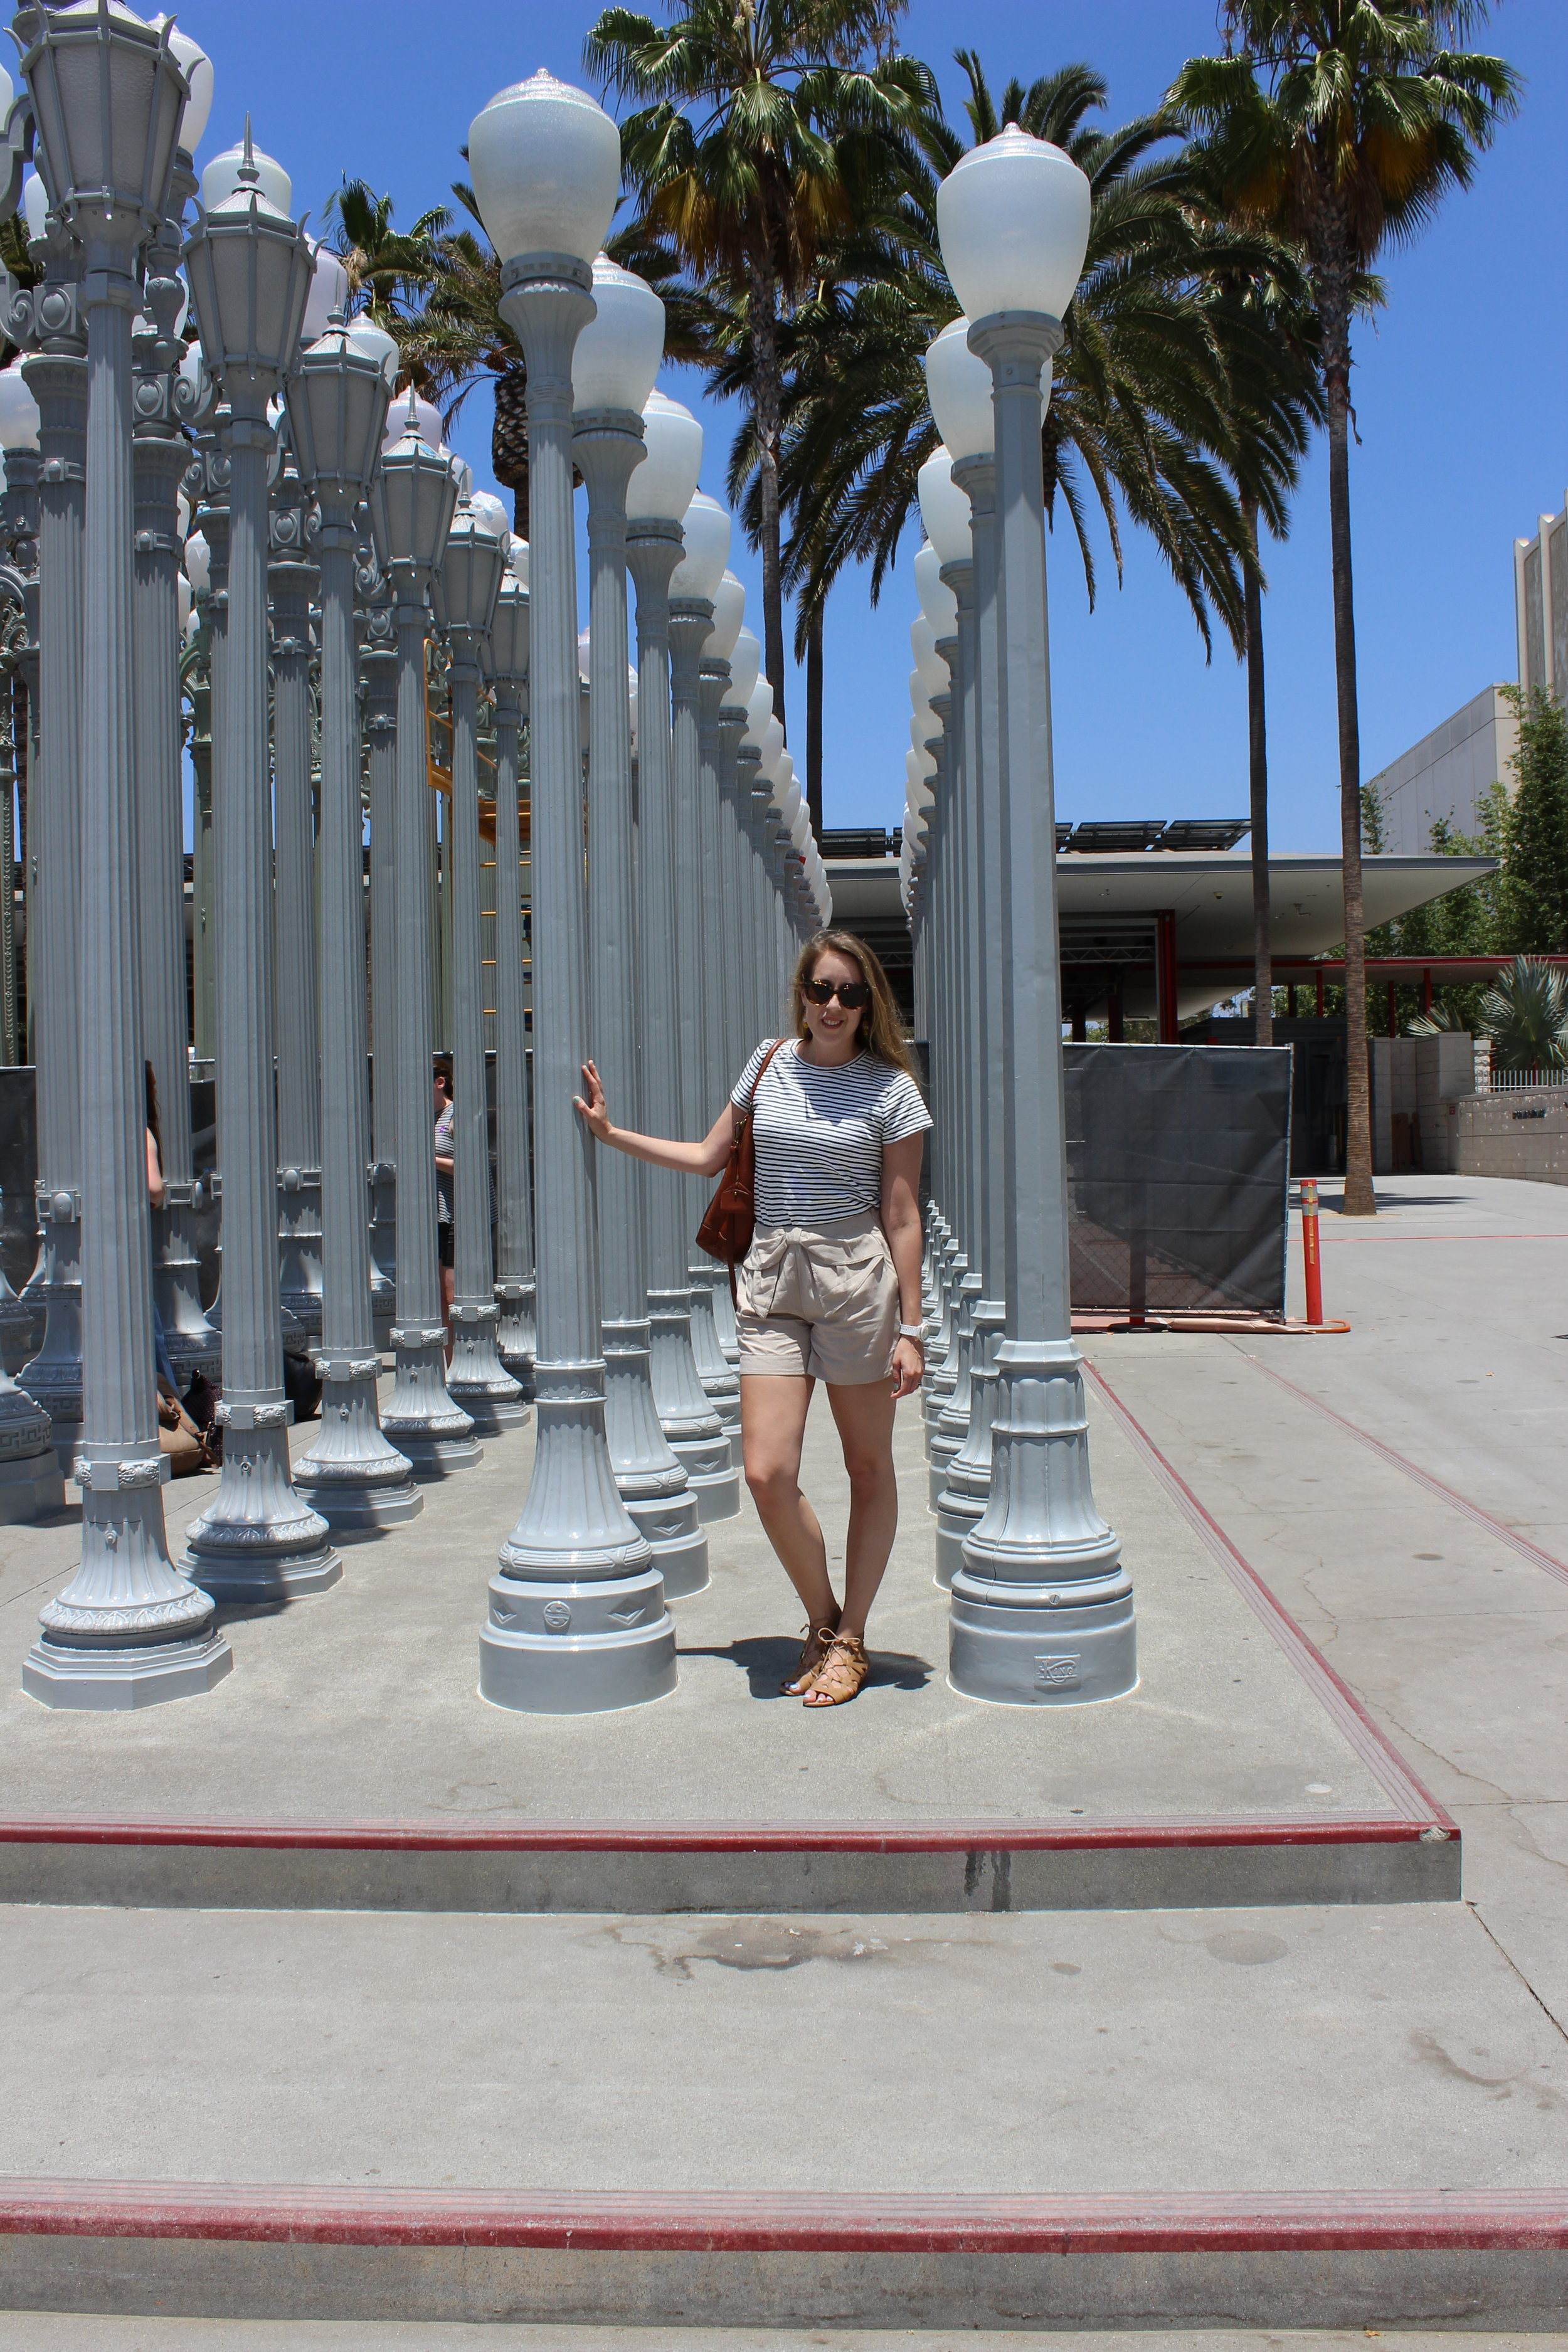 California Trip: Exploring Los Angeles in 3 Days